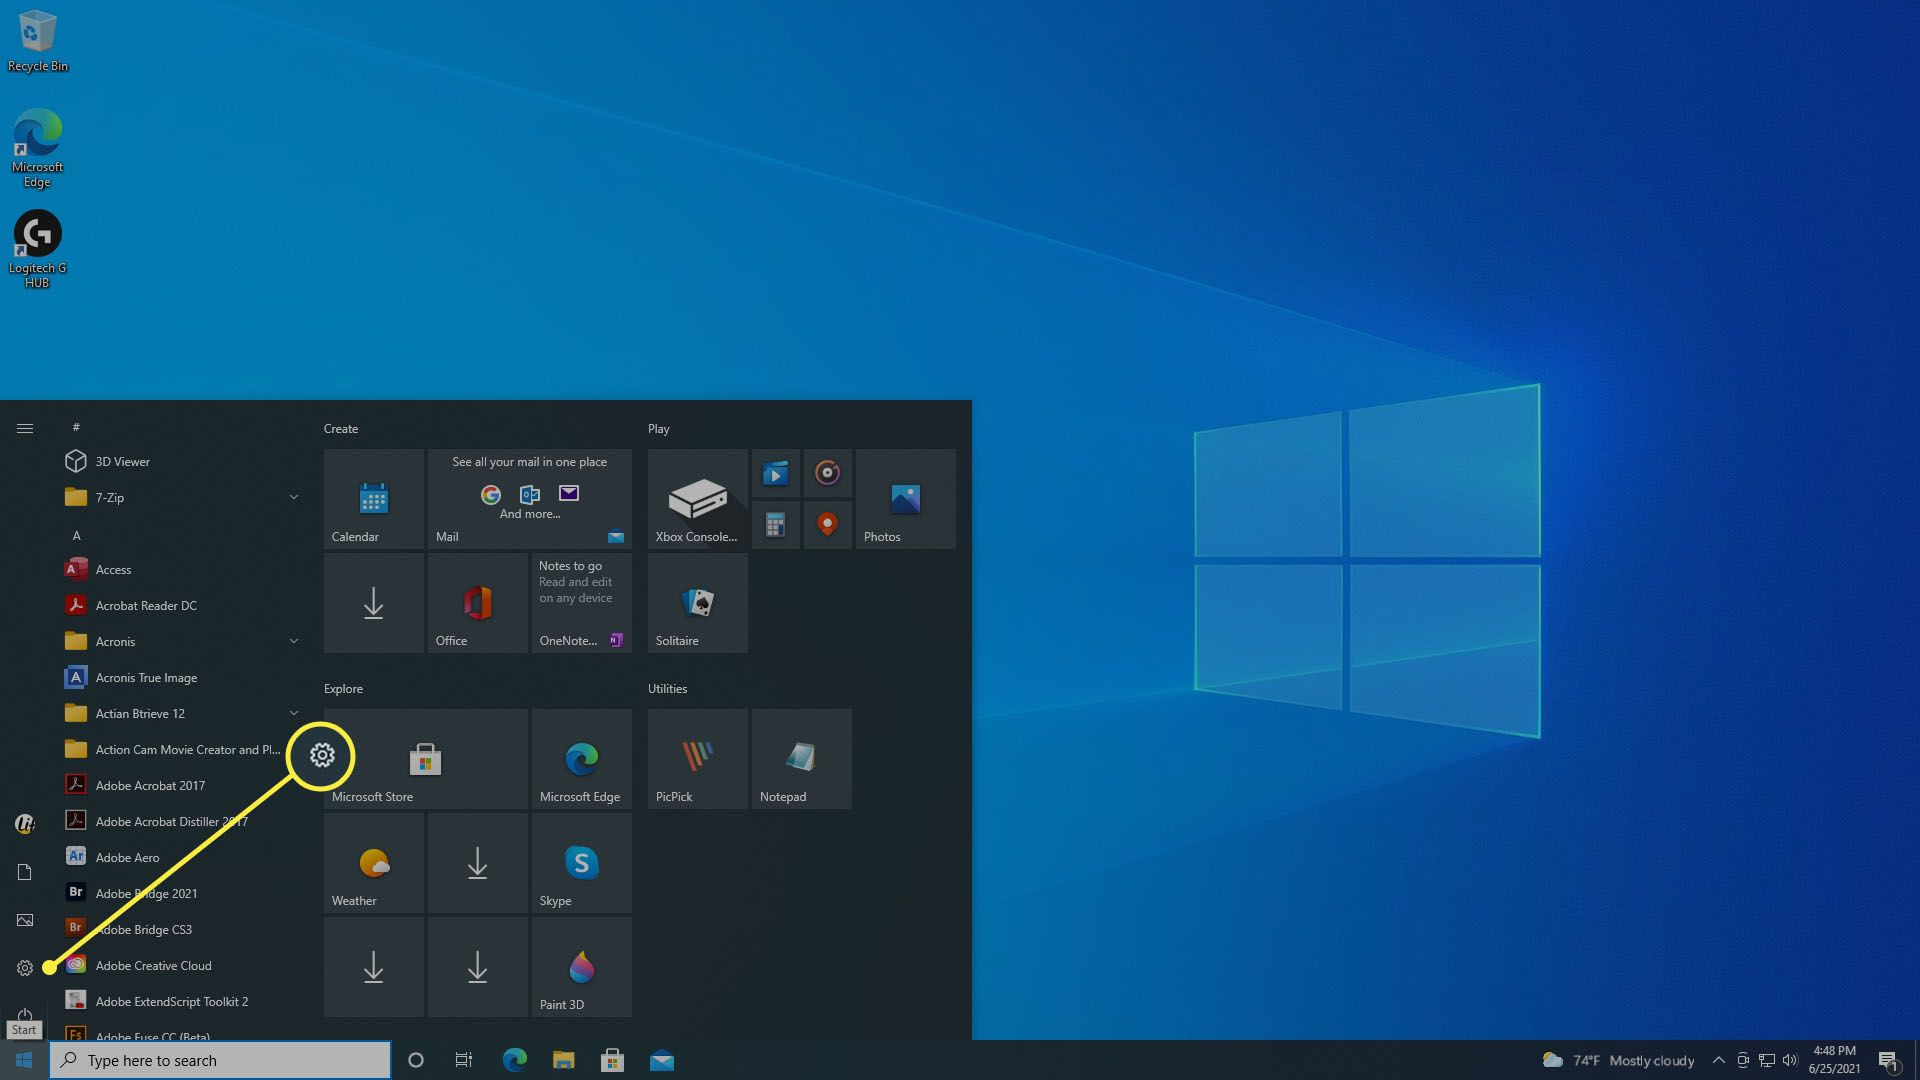 The Settings option on Windows 10 Start Menu.